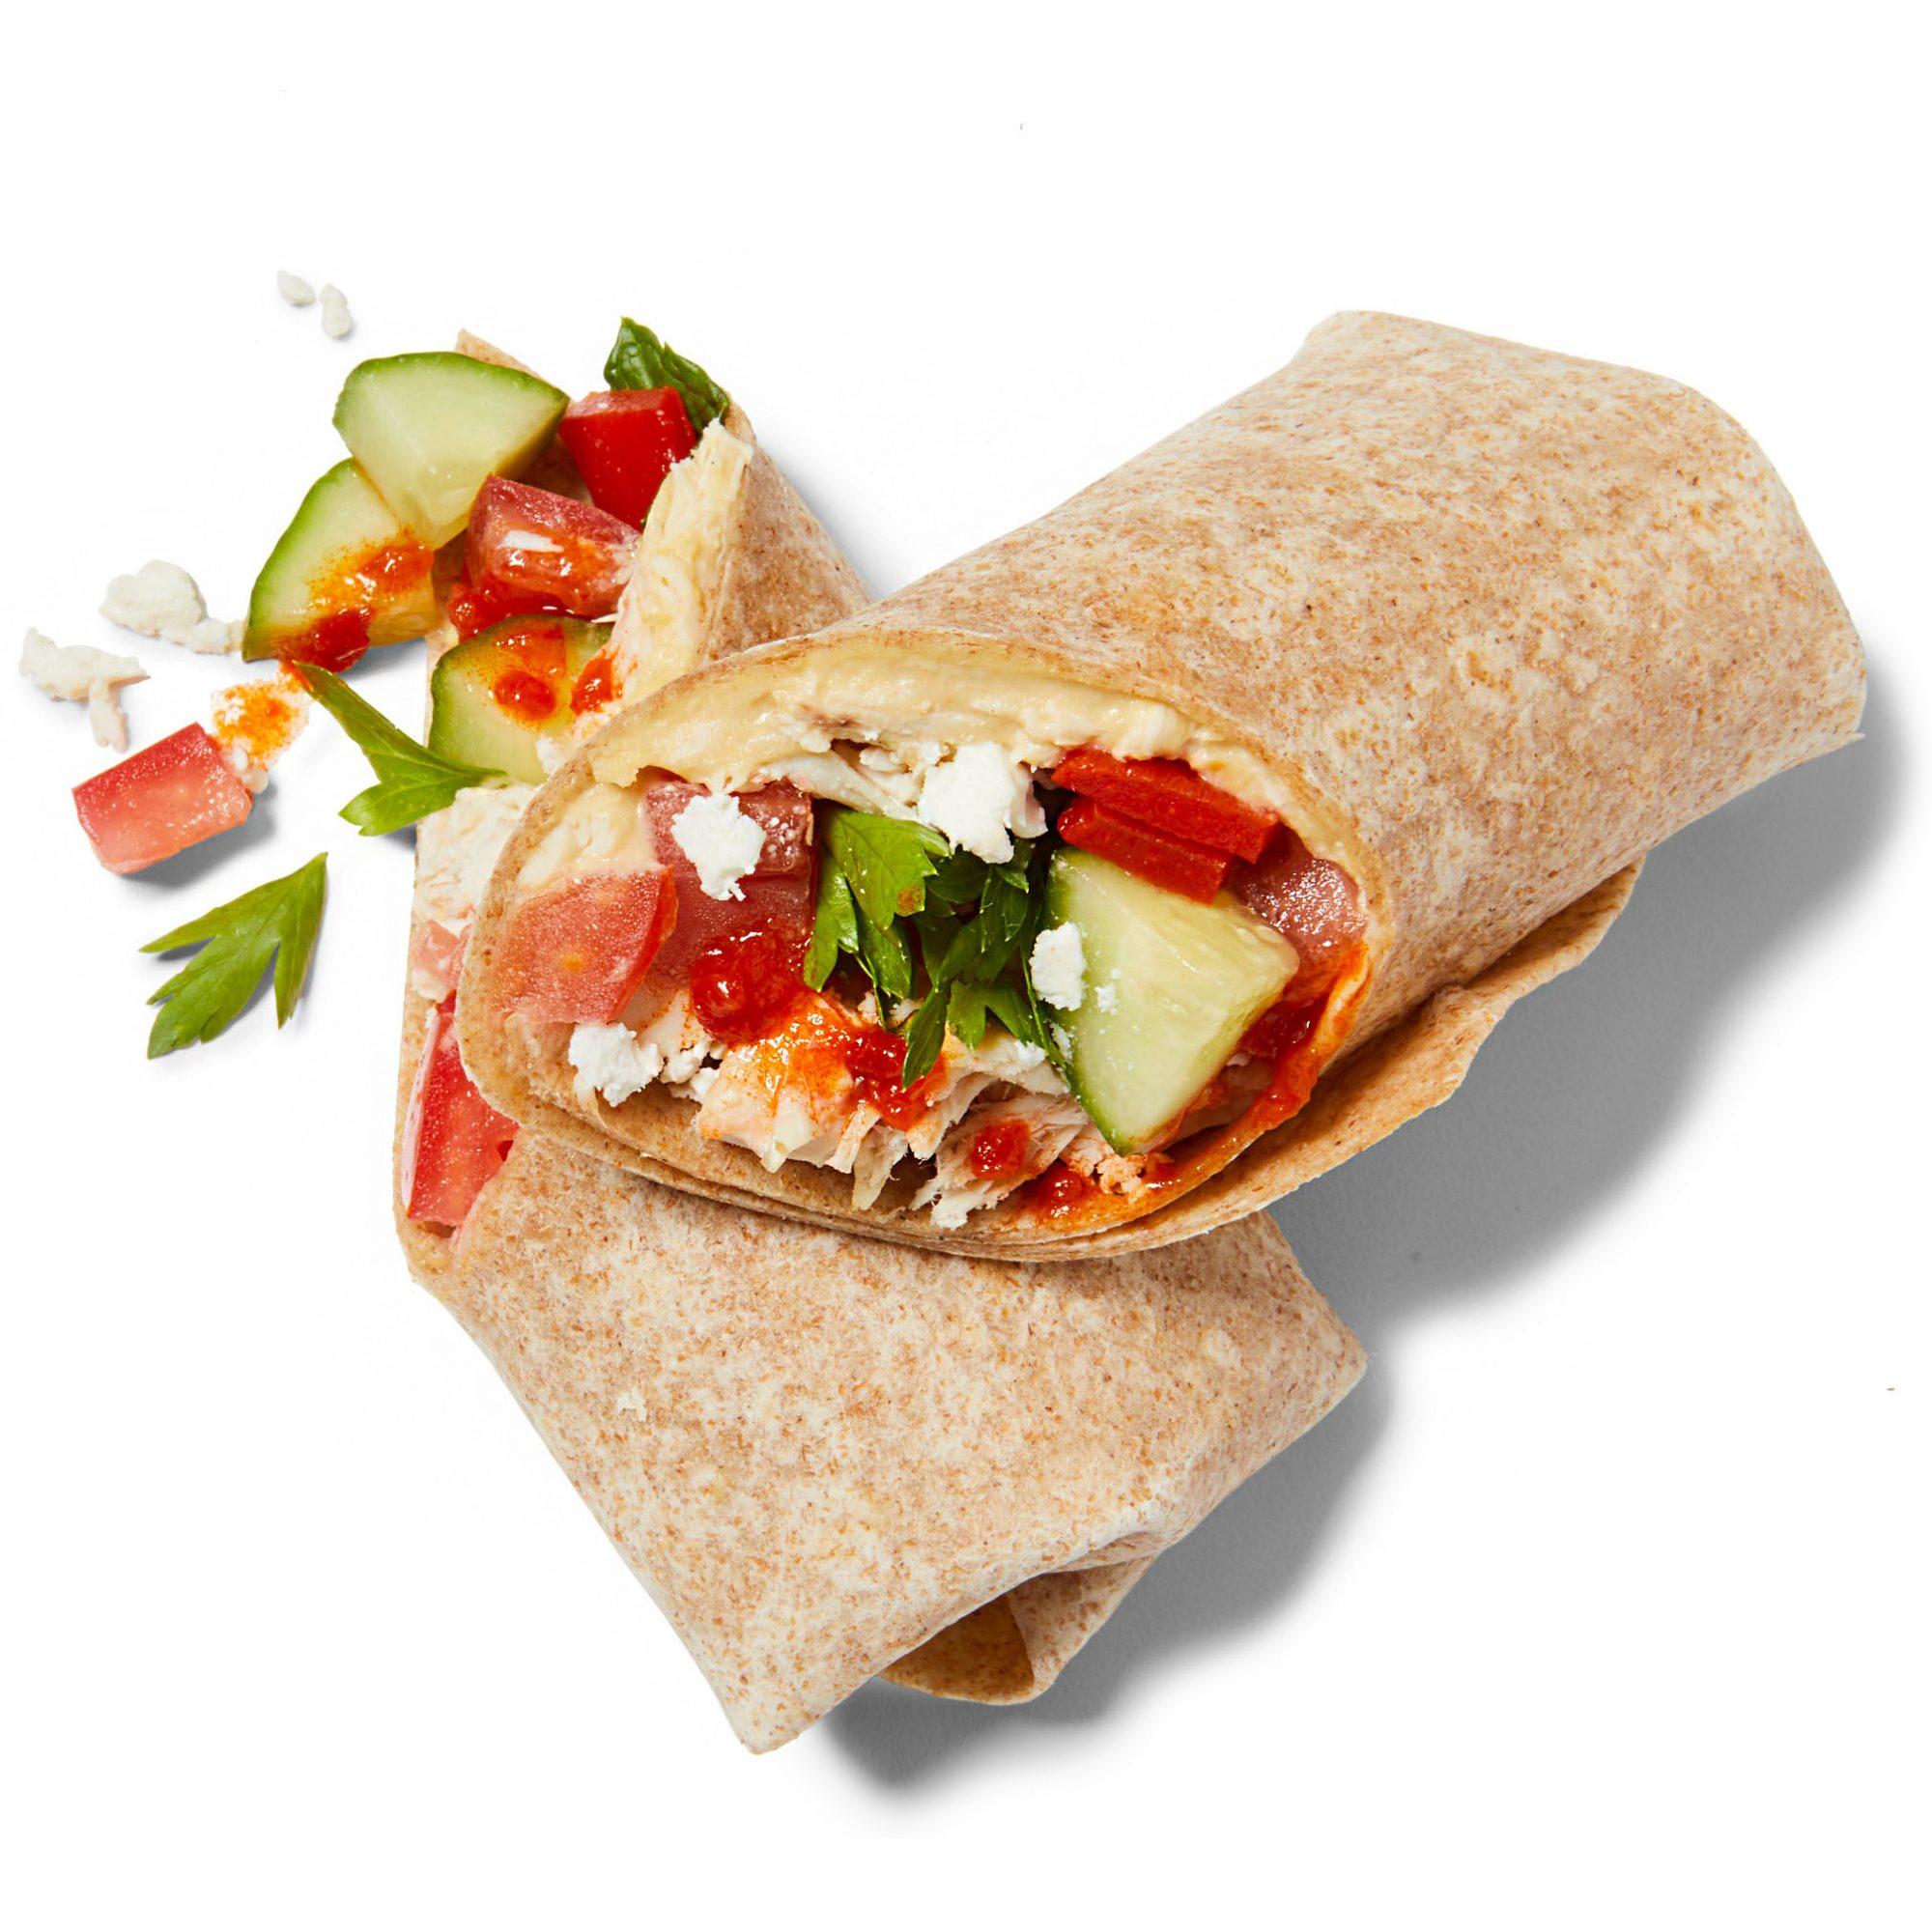 chicken and hummus wrap